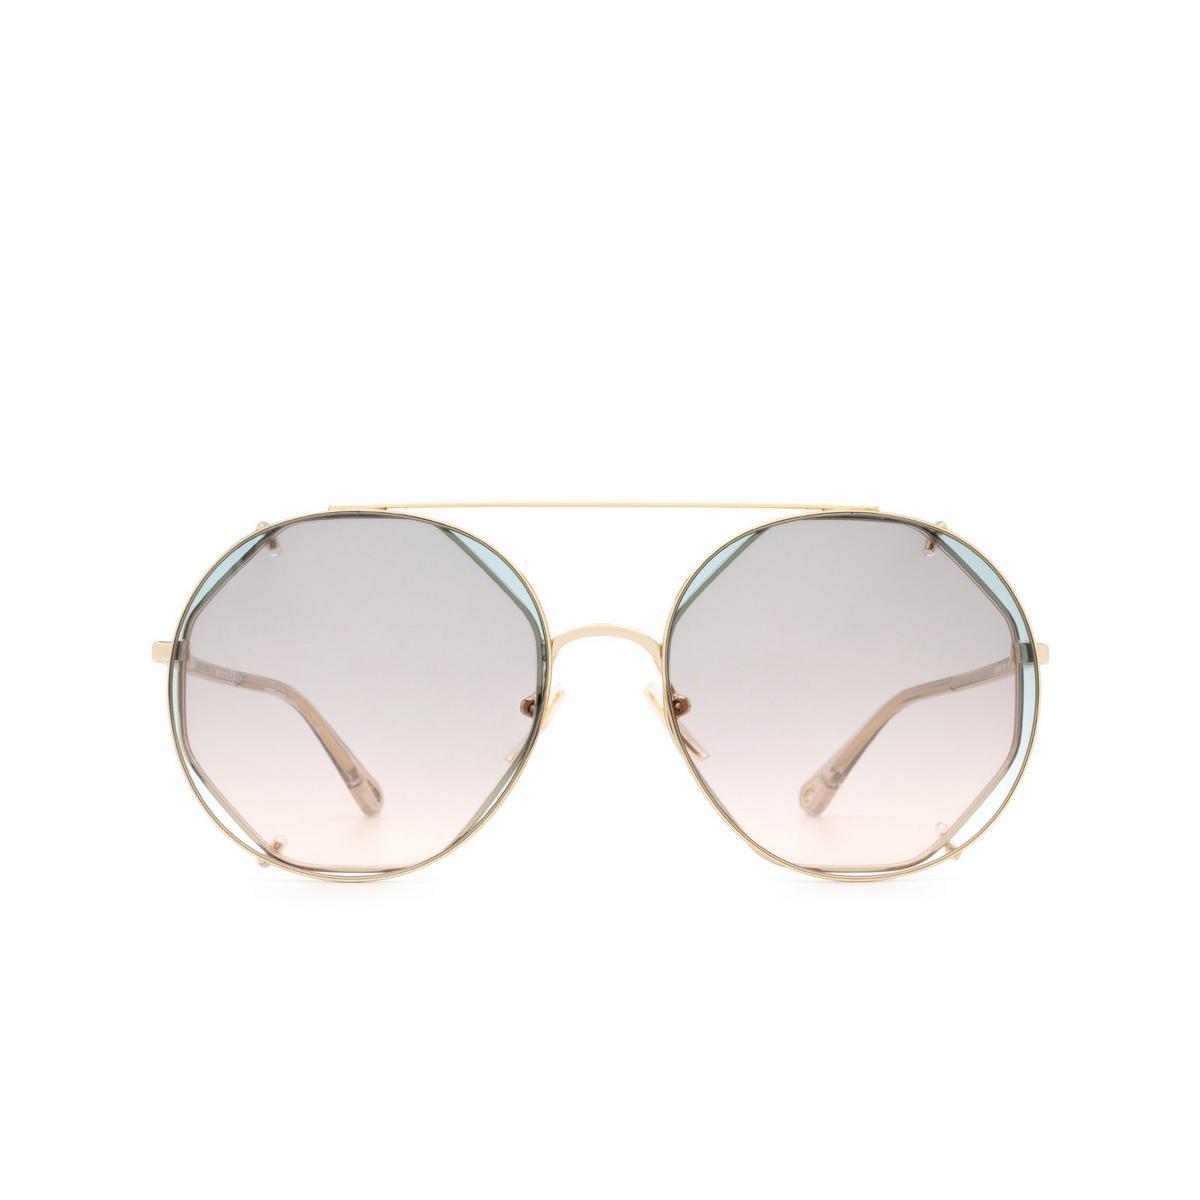 Chloé ® Round Sunglasses: CH0041S color Gold 001.